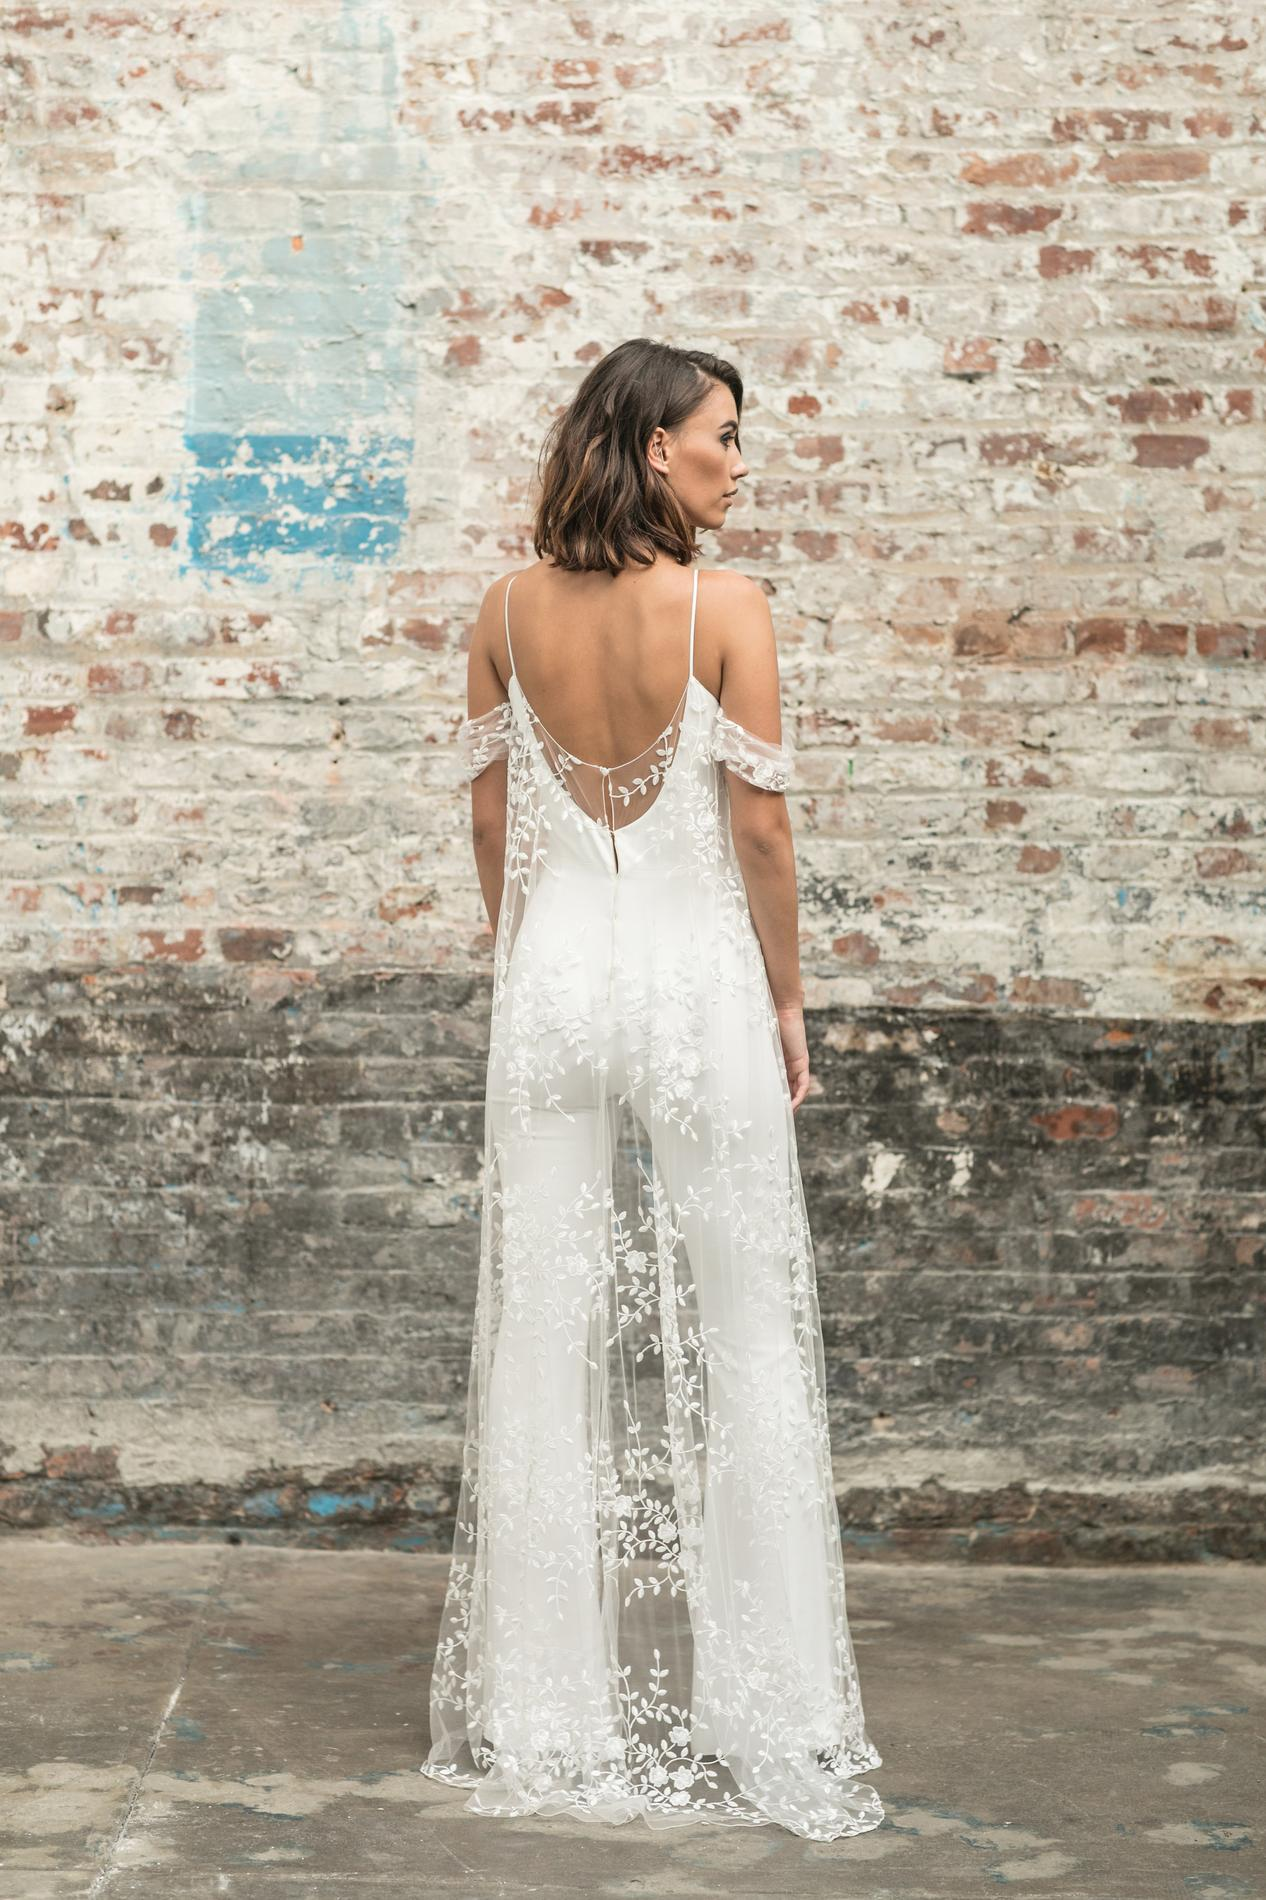 81854bdd558 ... Les robes de mariée civiles 2018 - Rime Arodaky ...